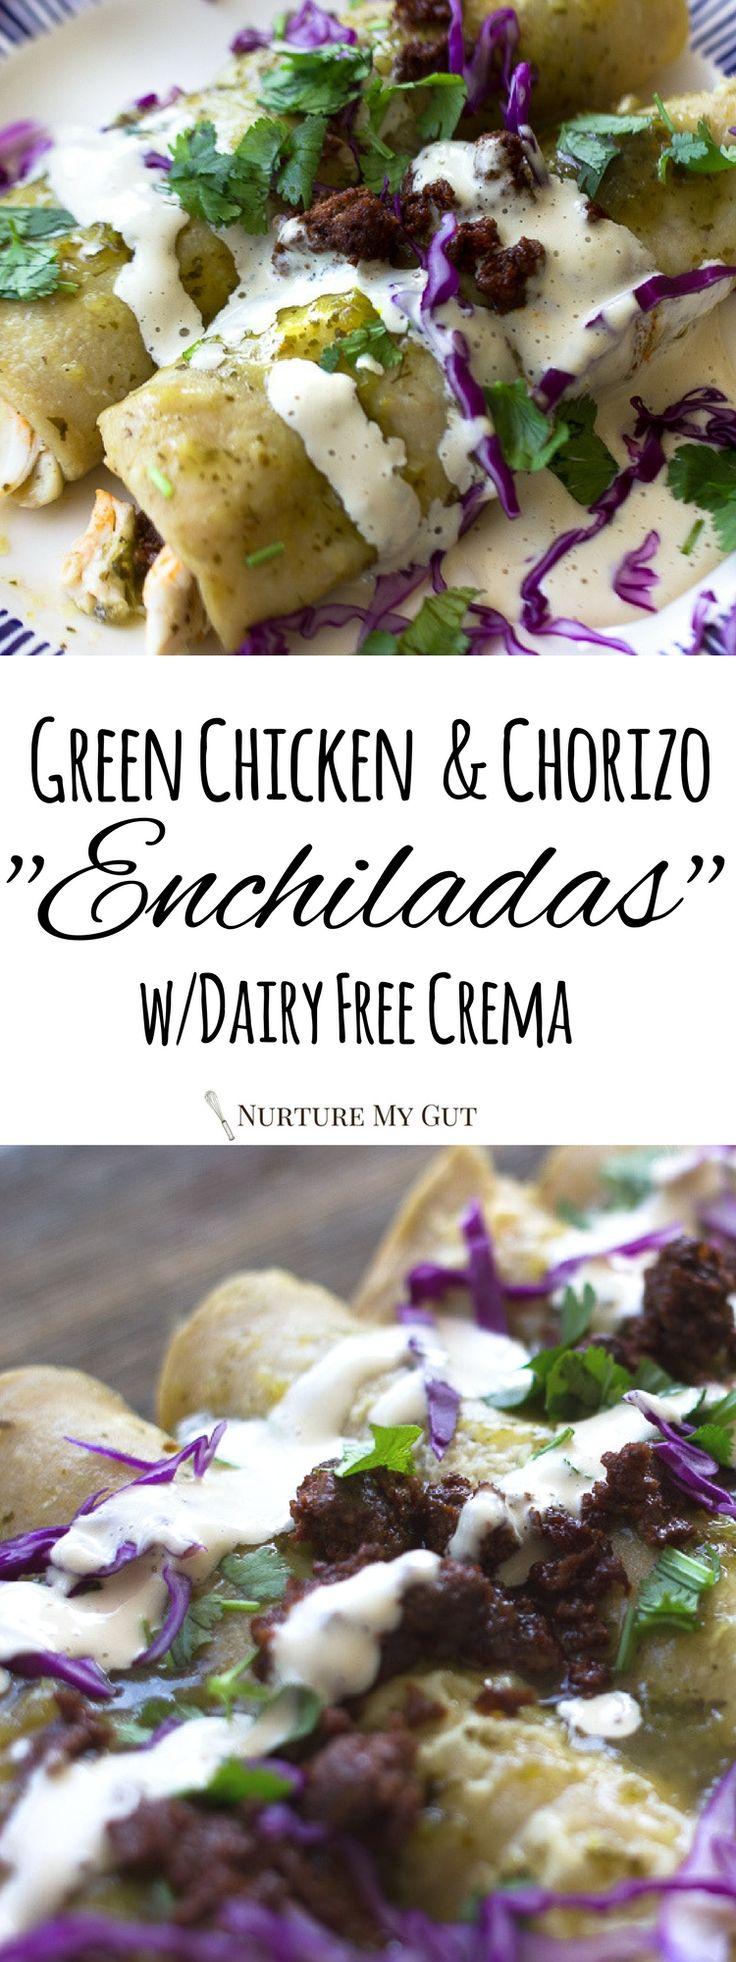 Green Chicken and Chorizo Enchiladas with Dairy Free Crema.  Best Green enchiladas!  Full of flavor, ready to wow!  Gluten Free, grain free option, dairy free.